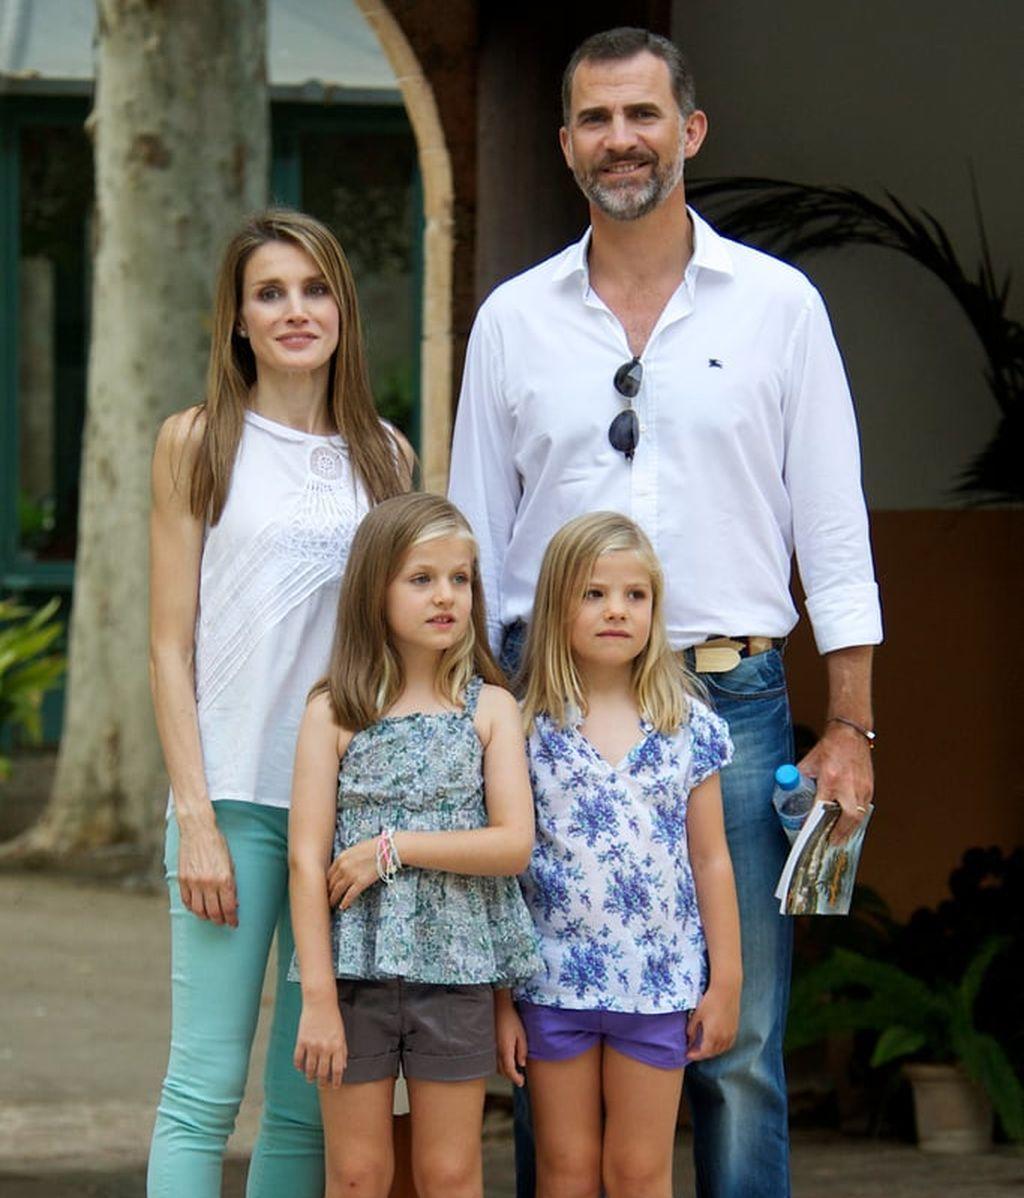 Letizia-Felipe-brought-daughters-Summer-trip-Palma